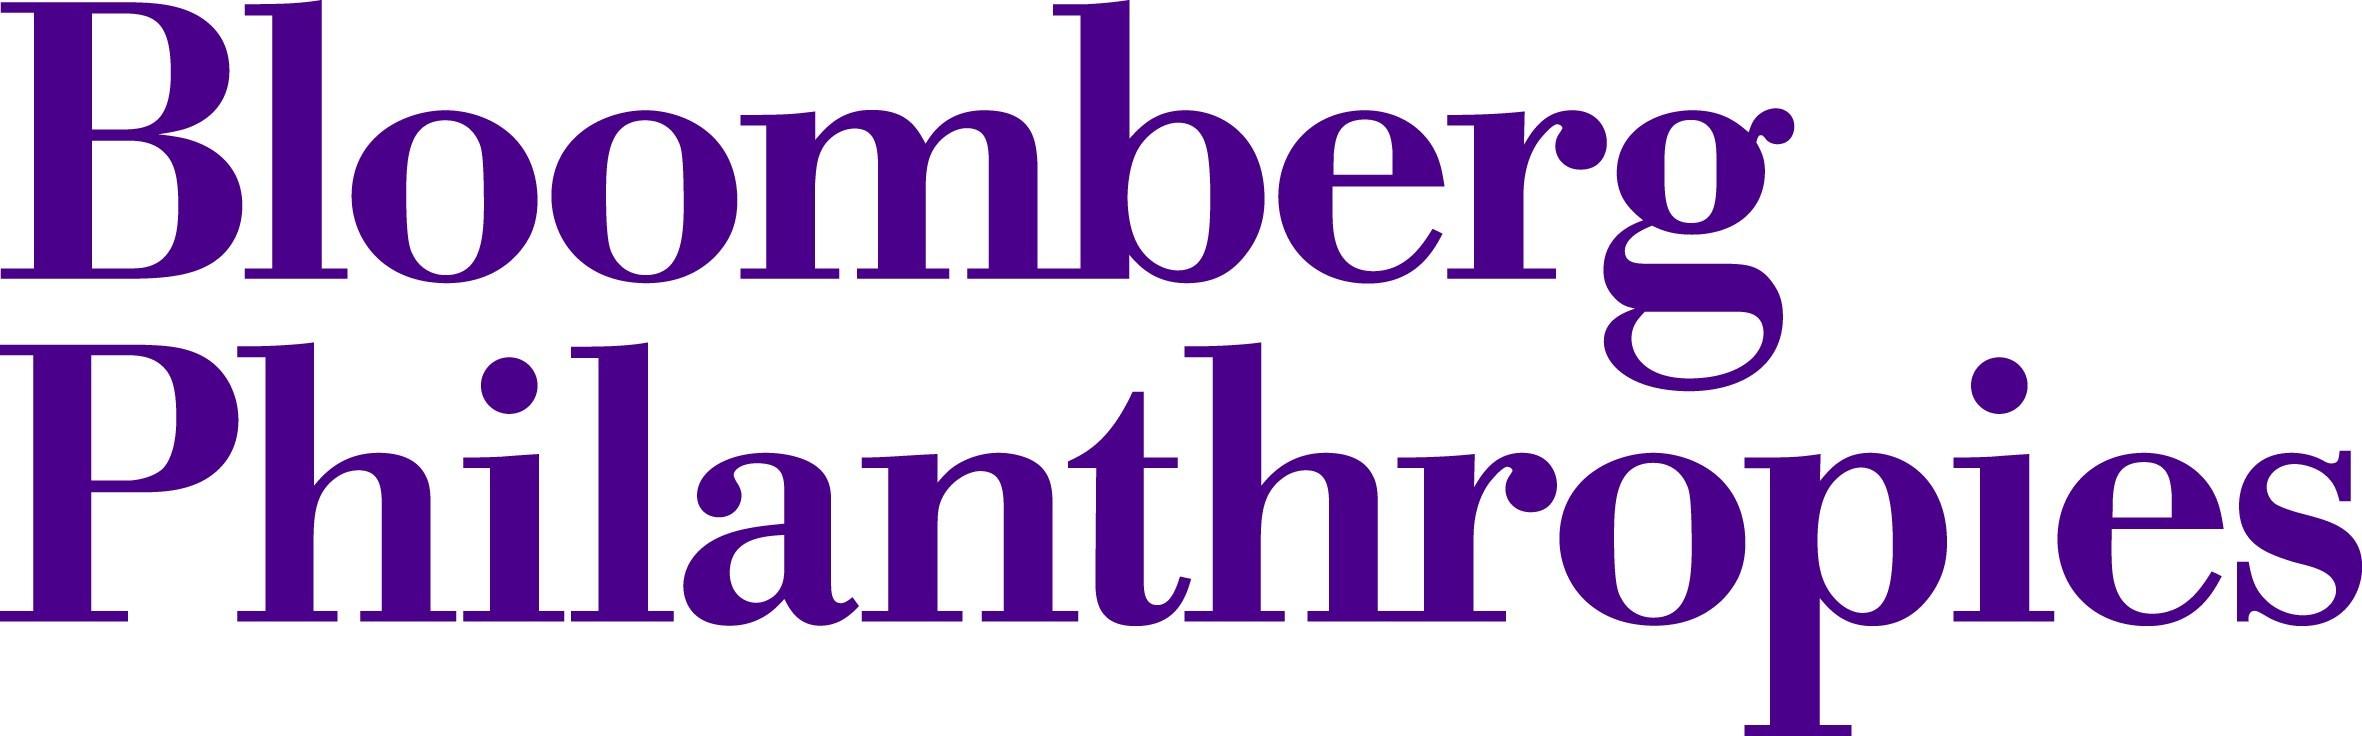 Bloomberg Philanthropies Launches New $160 Million Program